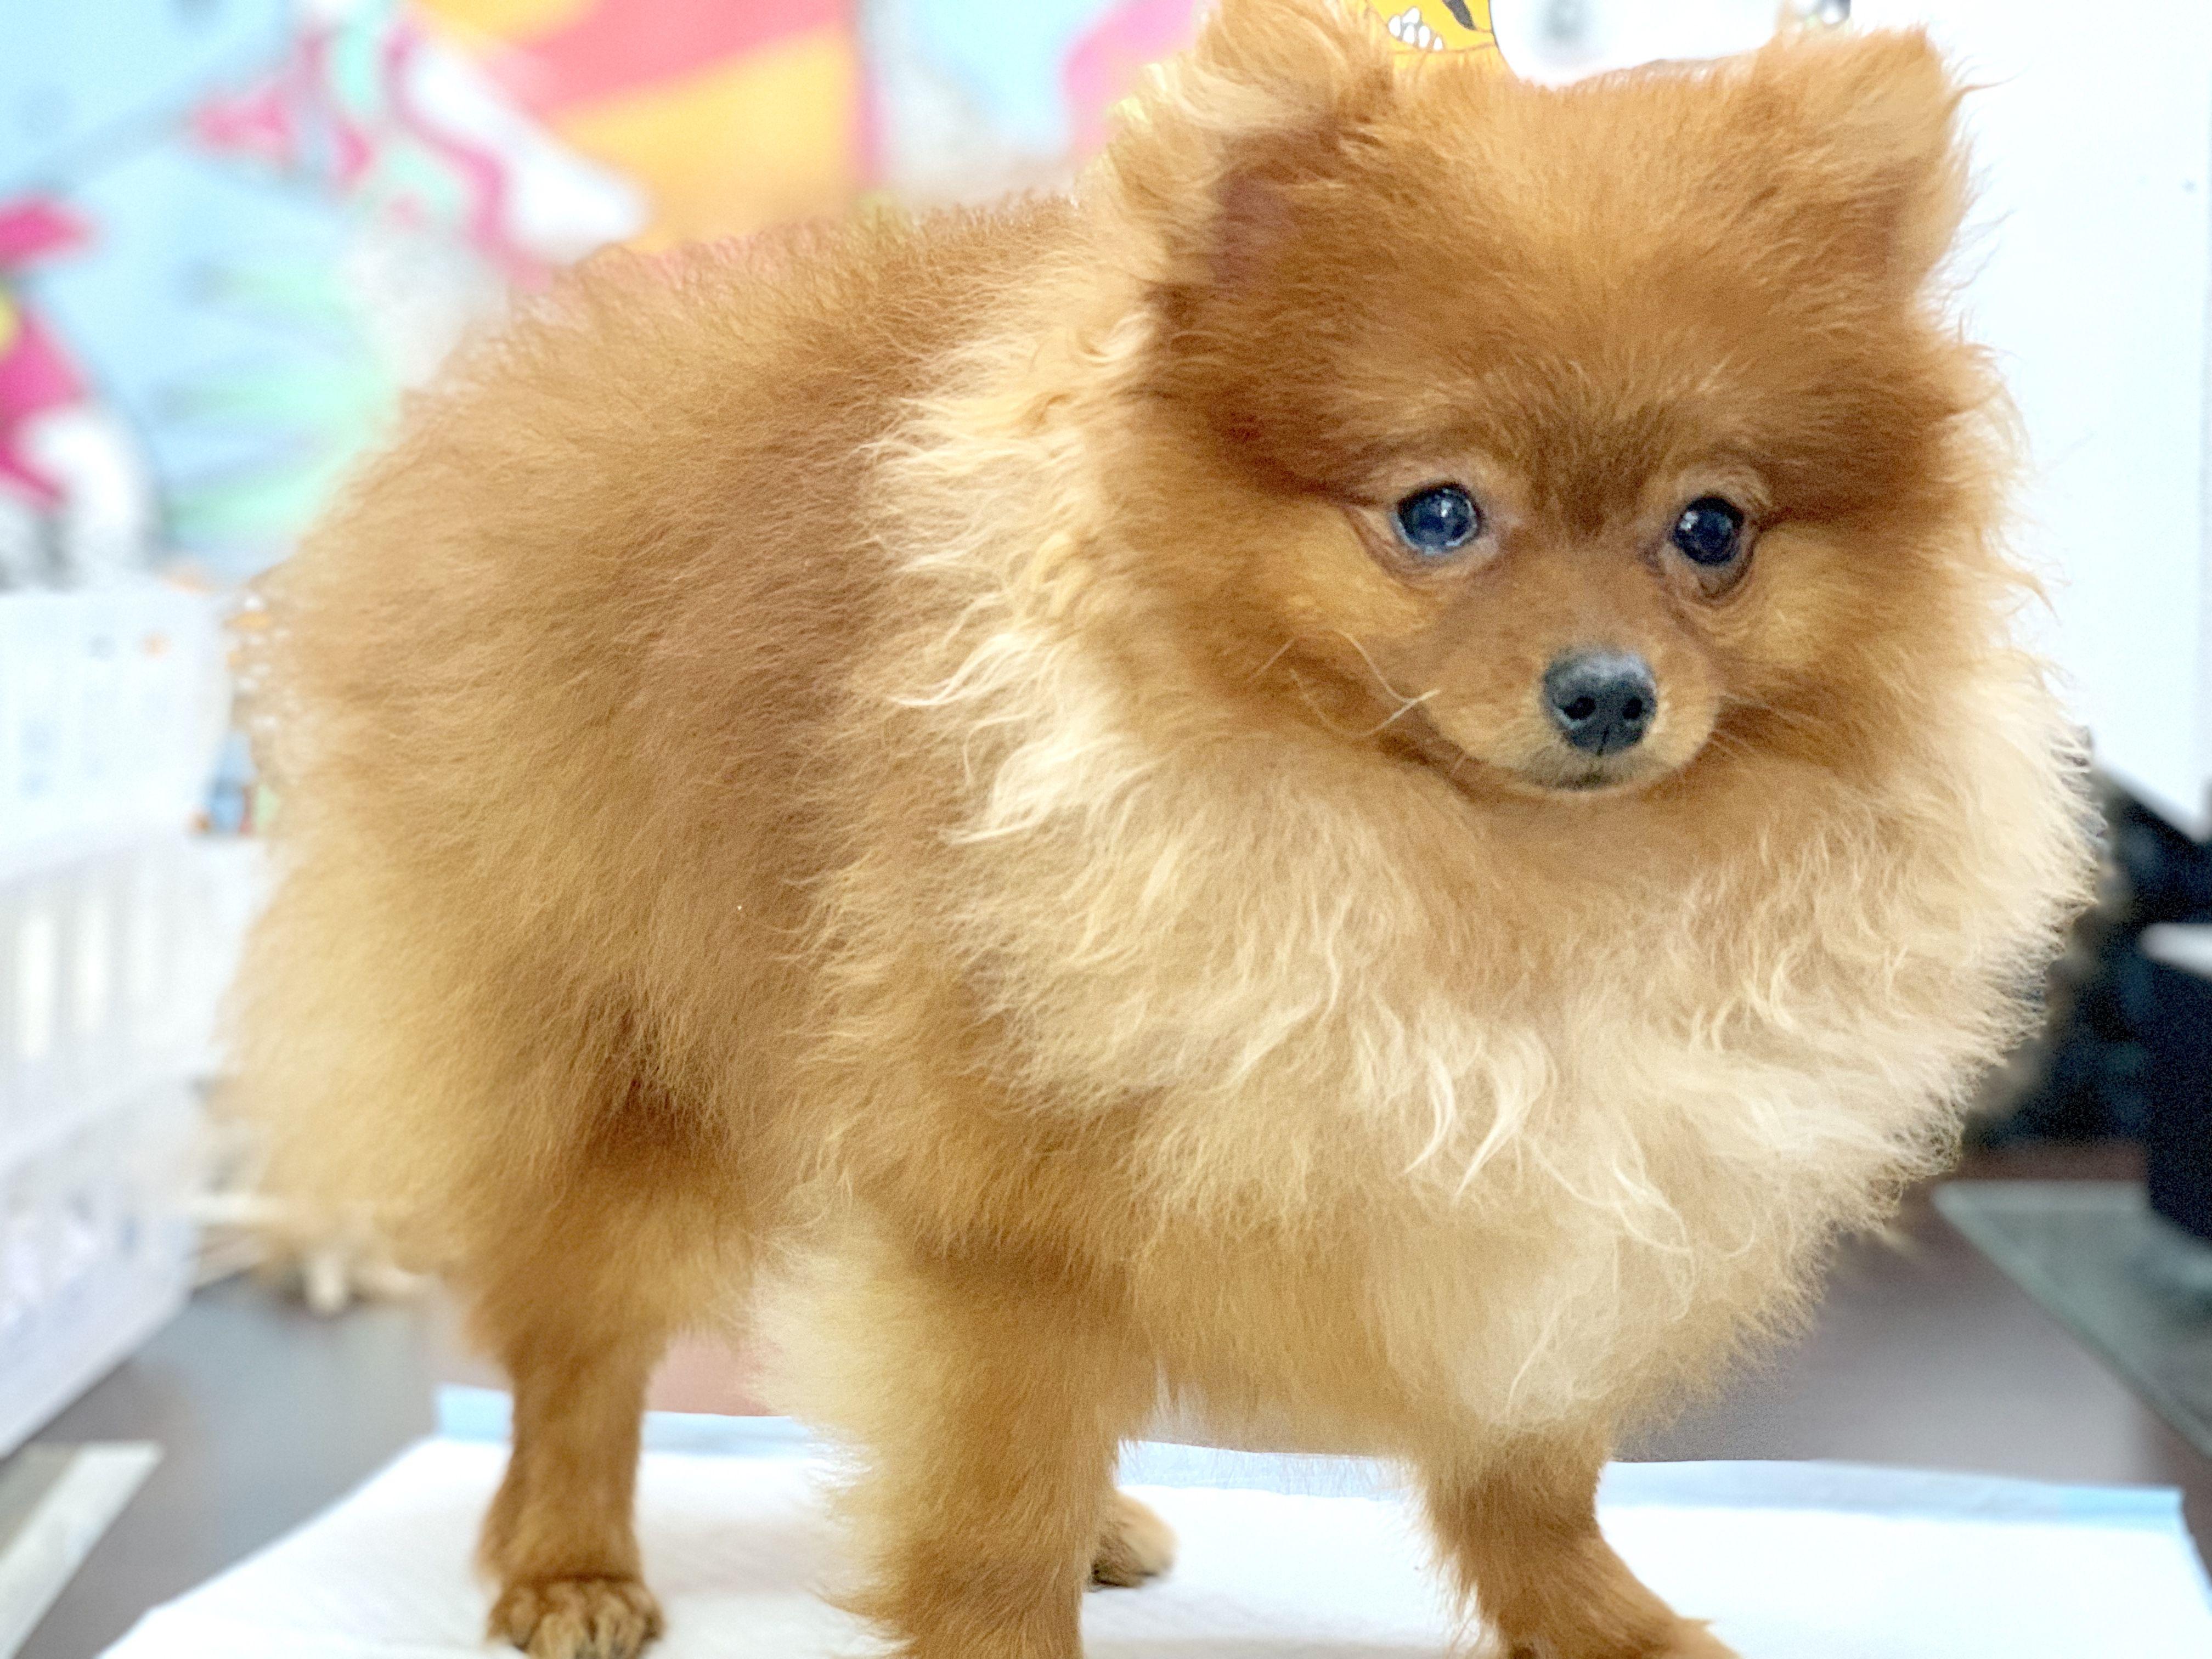 Pomeranian For Sale Pomeranian Puppy For Sale Puppies For Sale Pomeranian For Sale